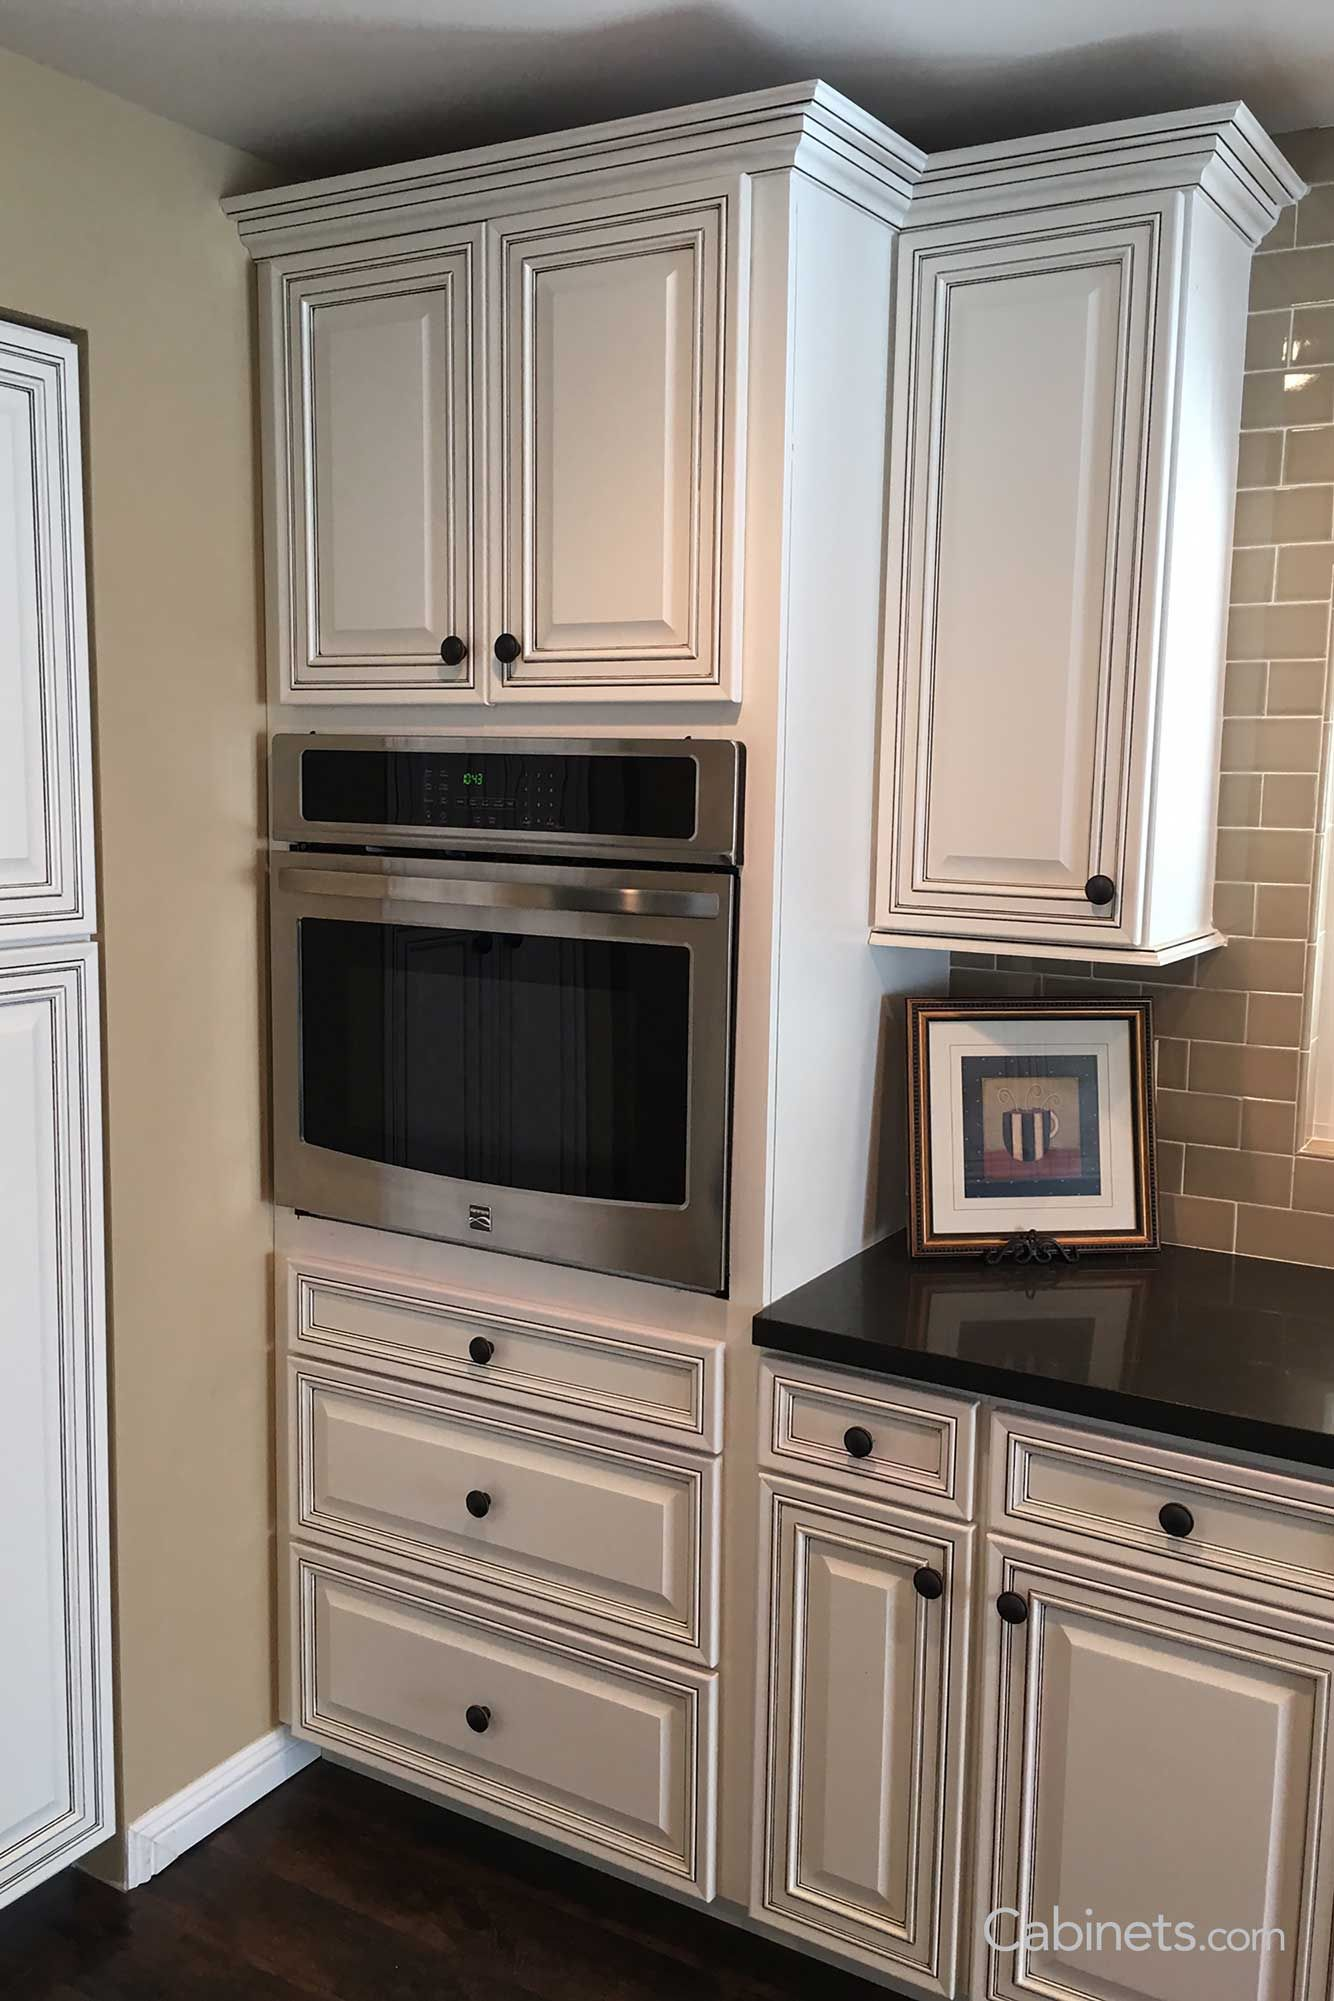 Bronson Maple Bright White Chocolate Glaze Glazed Kitchen Cabinets Kitchen Remodel Kitchen Decor